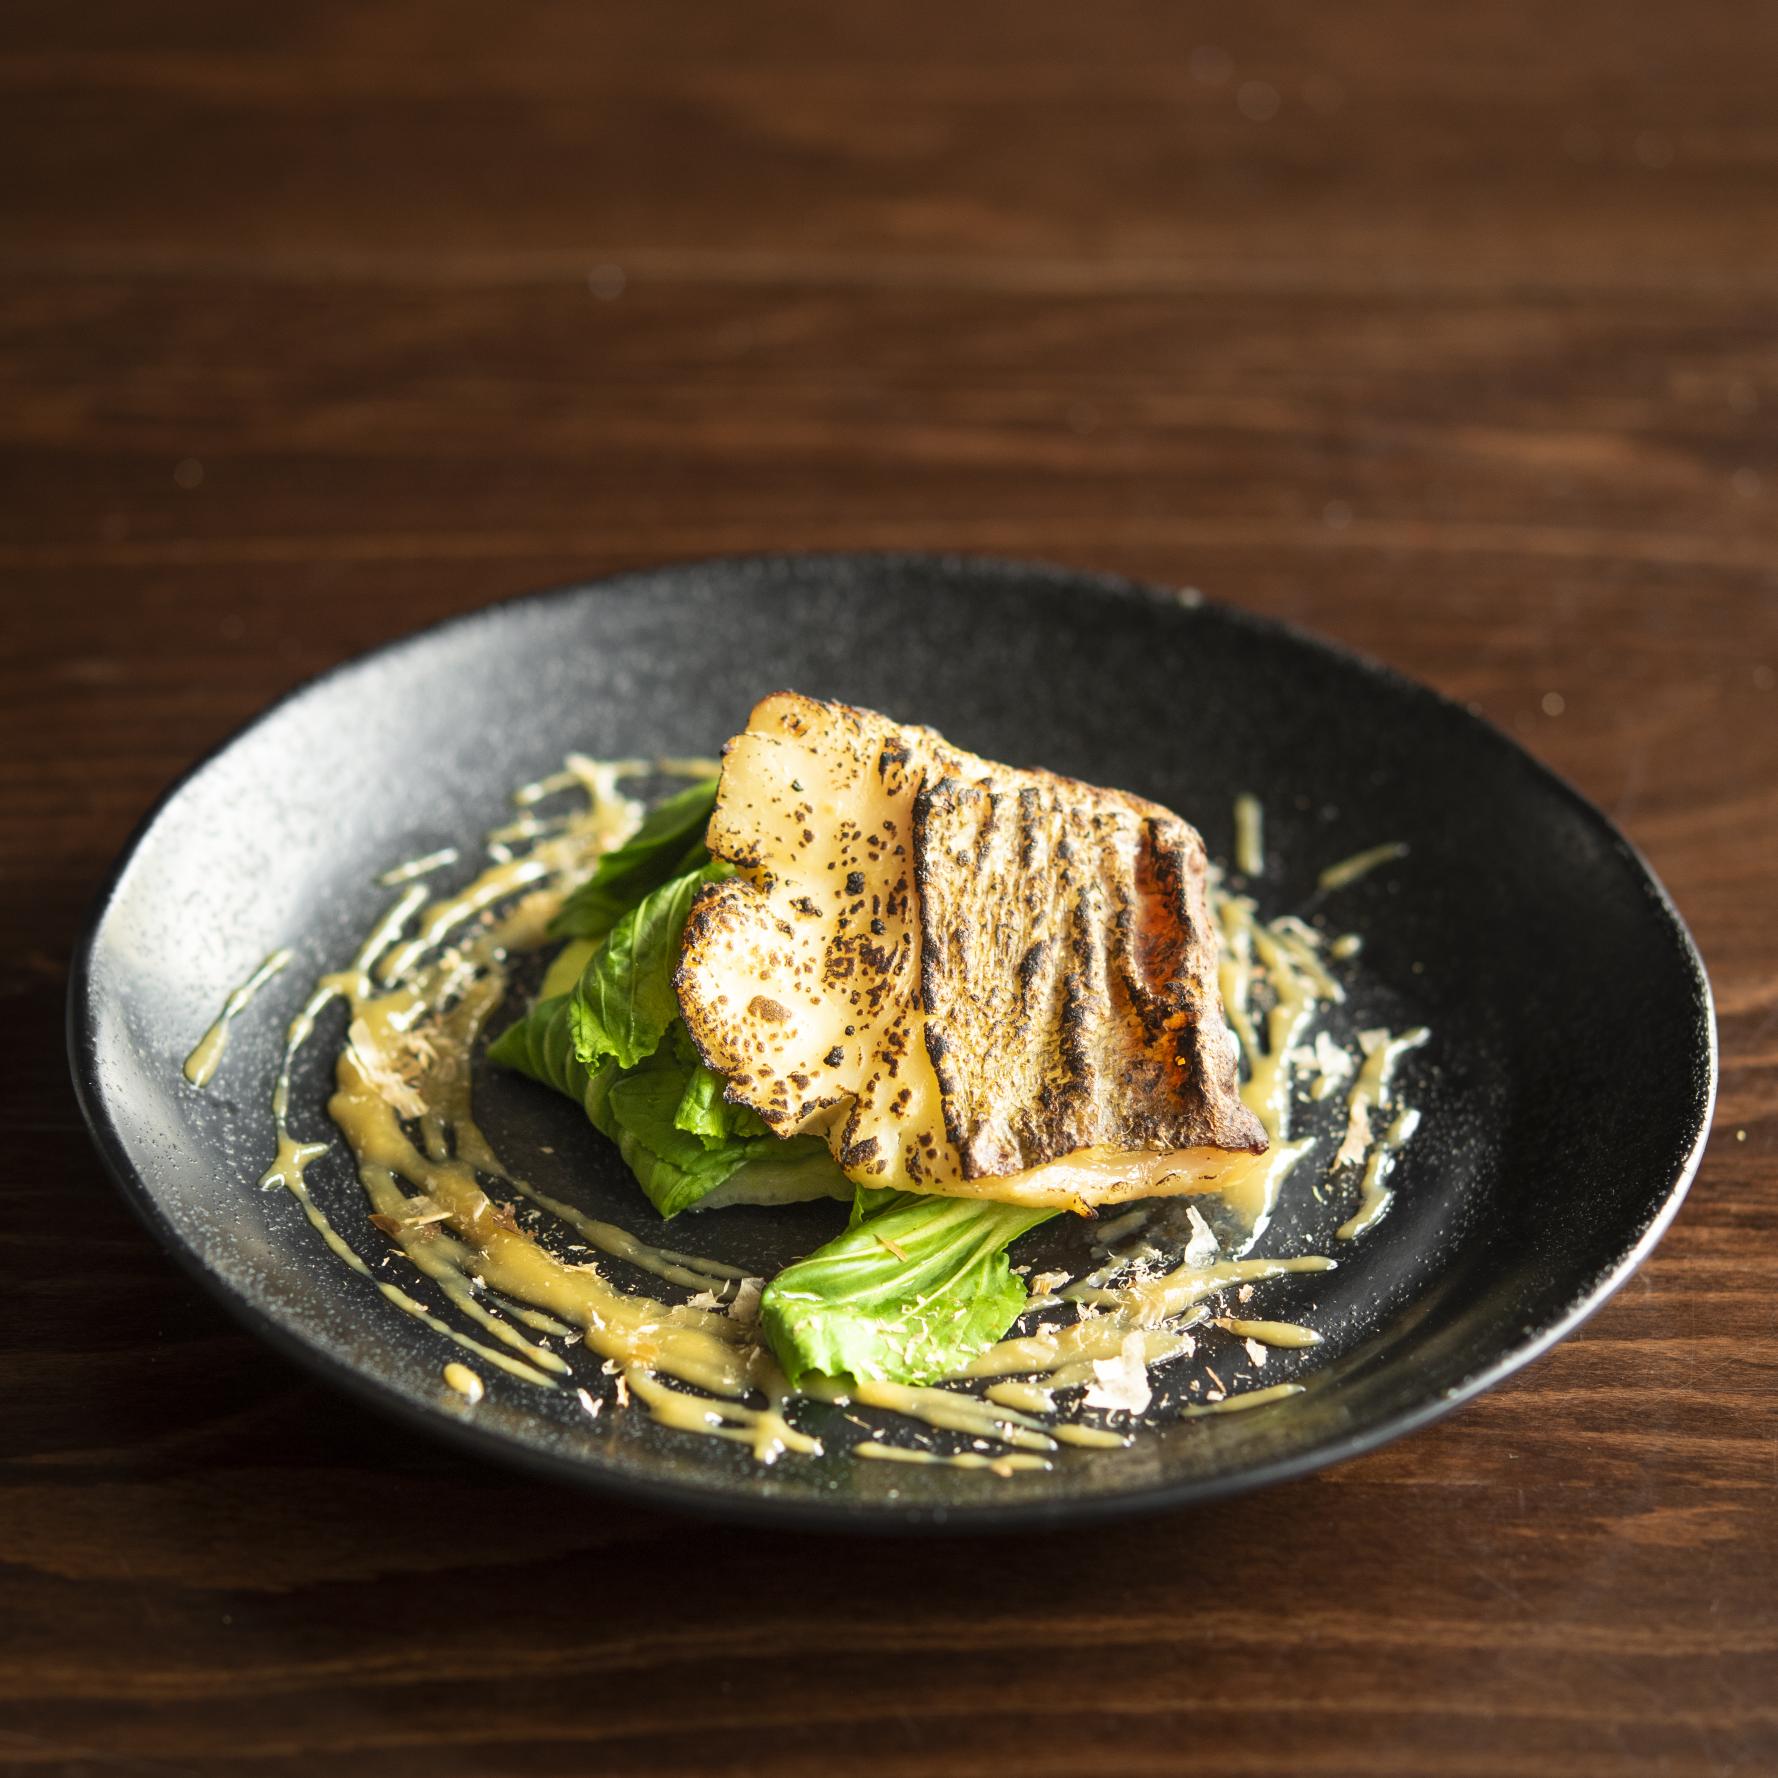 DSC_7316 - Miso marinated cod, bok choi, radish.png